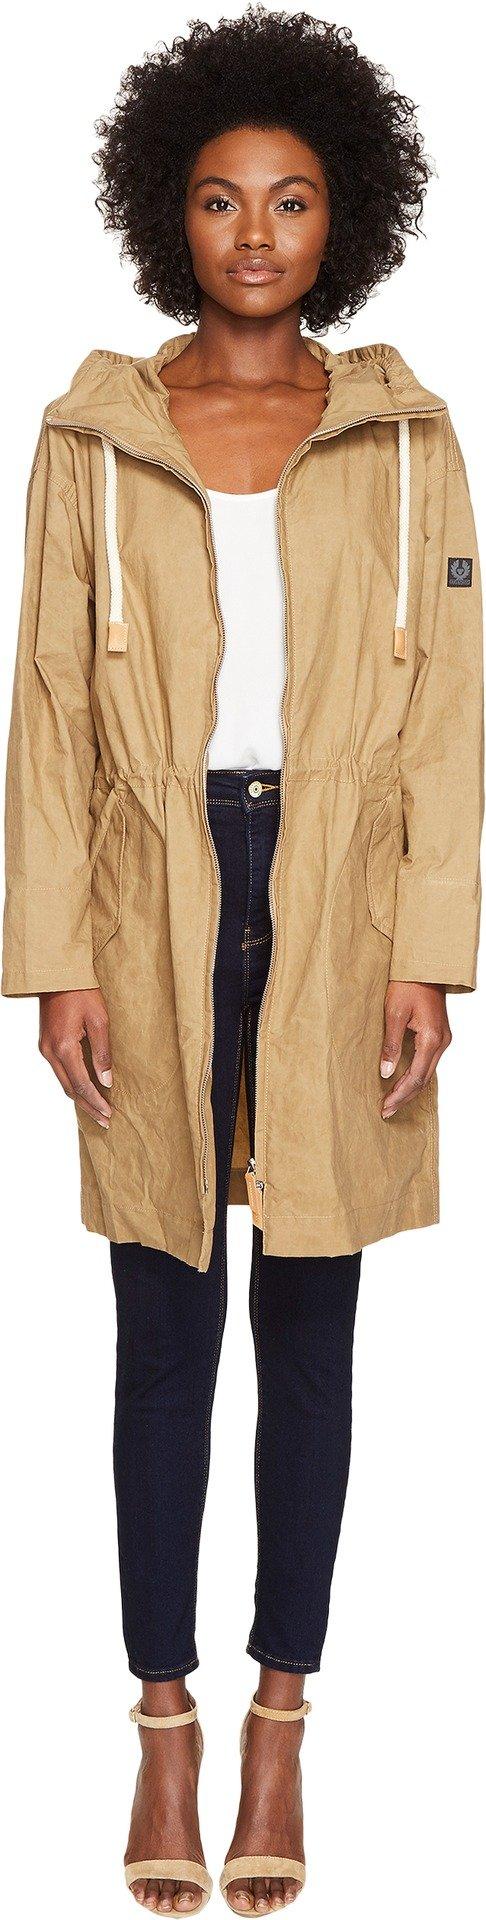 Women's Belstaff Rivingten Adventure Travel Jacket - Golden Khaki - EURO SIZE 36/US SIZE S